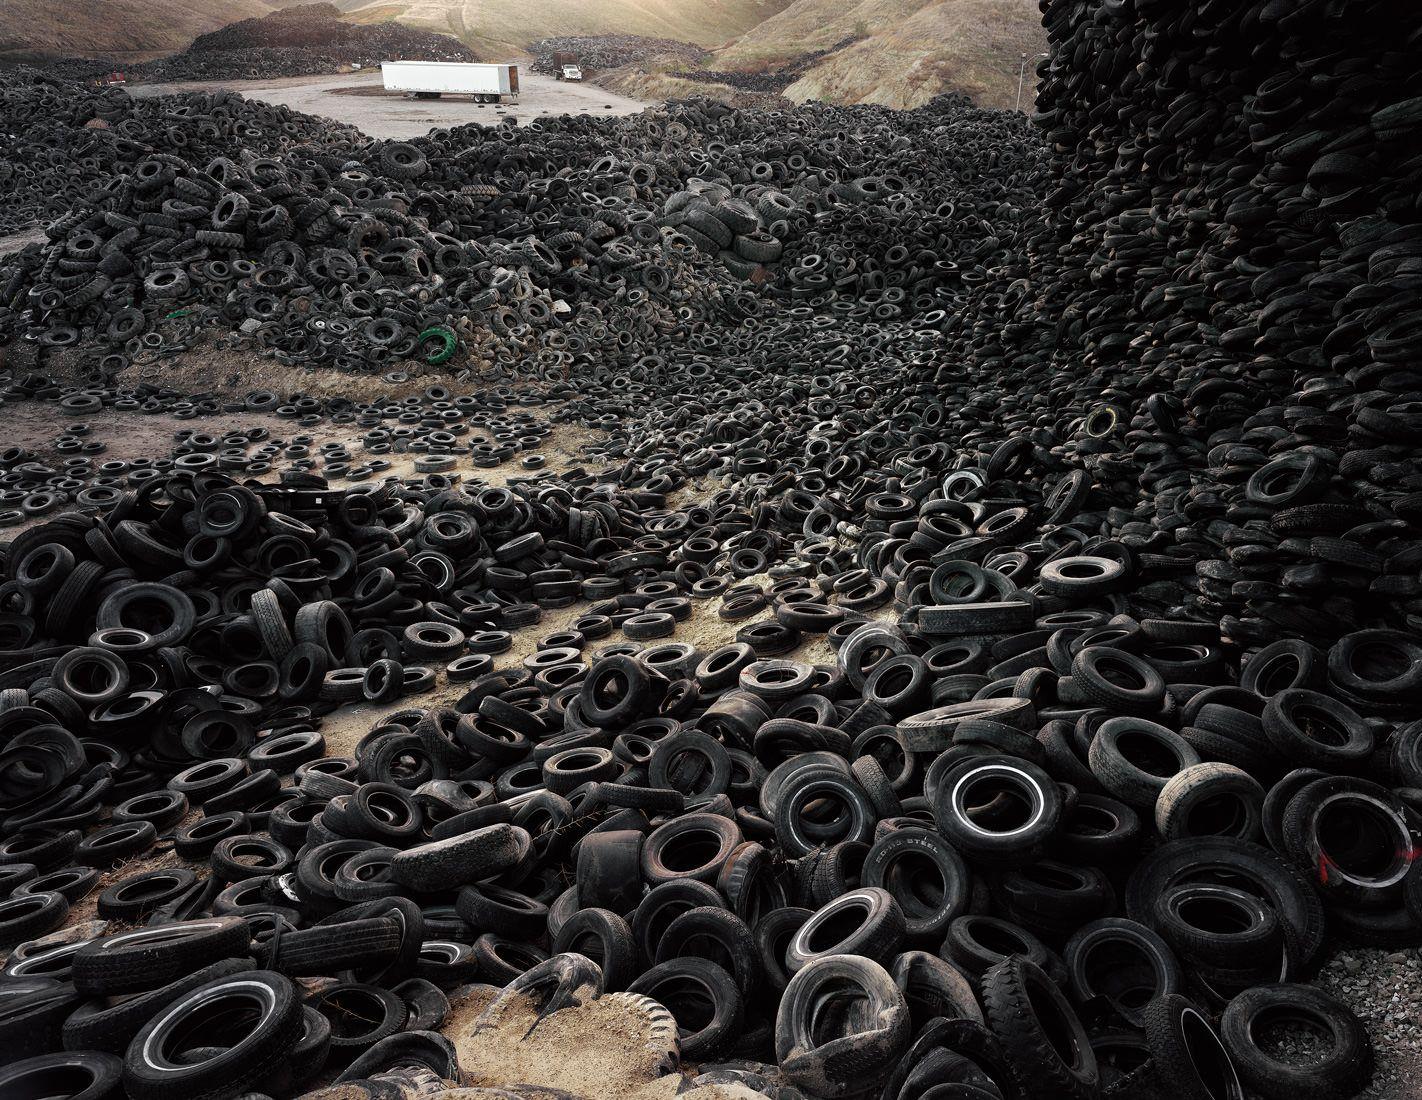 Oxford tire pile no 1 westley california 1999 by for Edward burtynsky